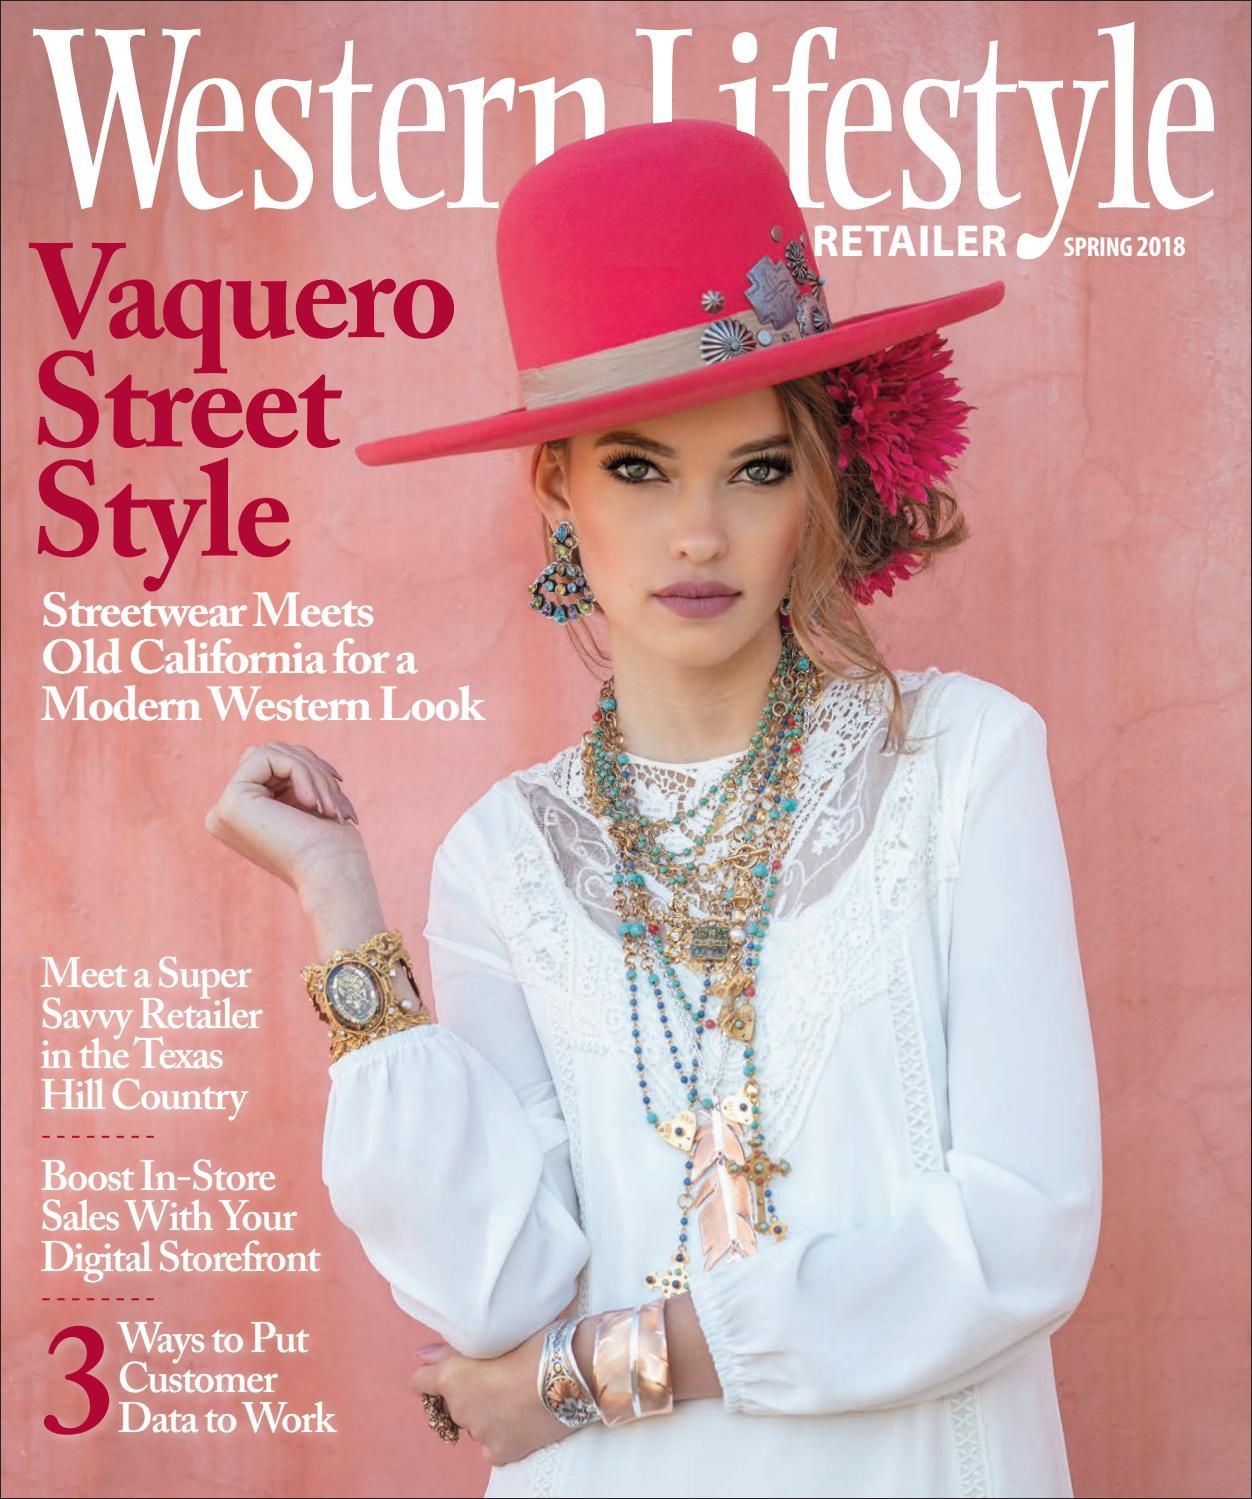 036ef1670c8 Western Lifestyle Spring 2018 by Morris Media Network - issuu